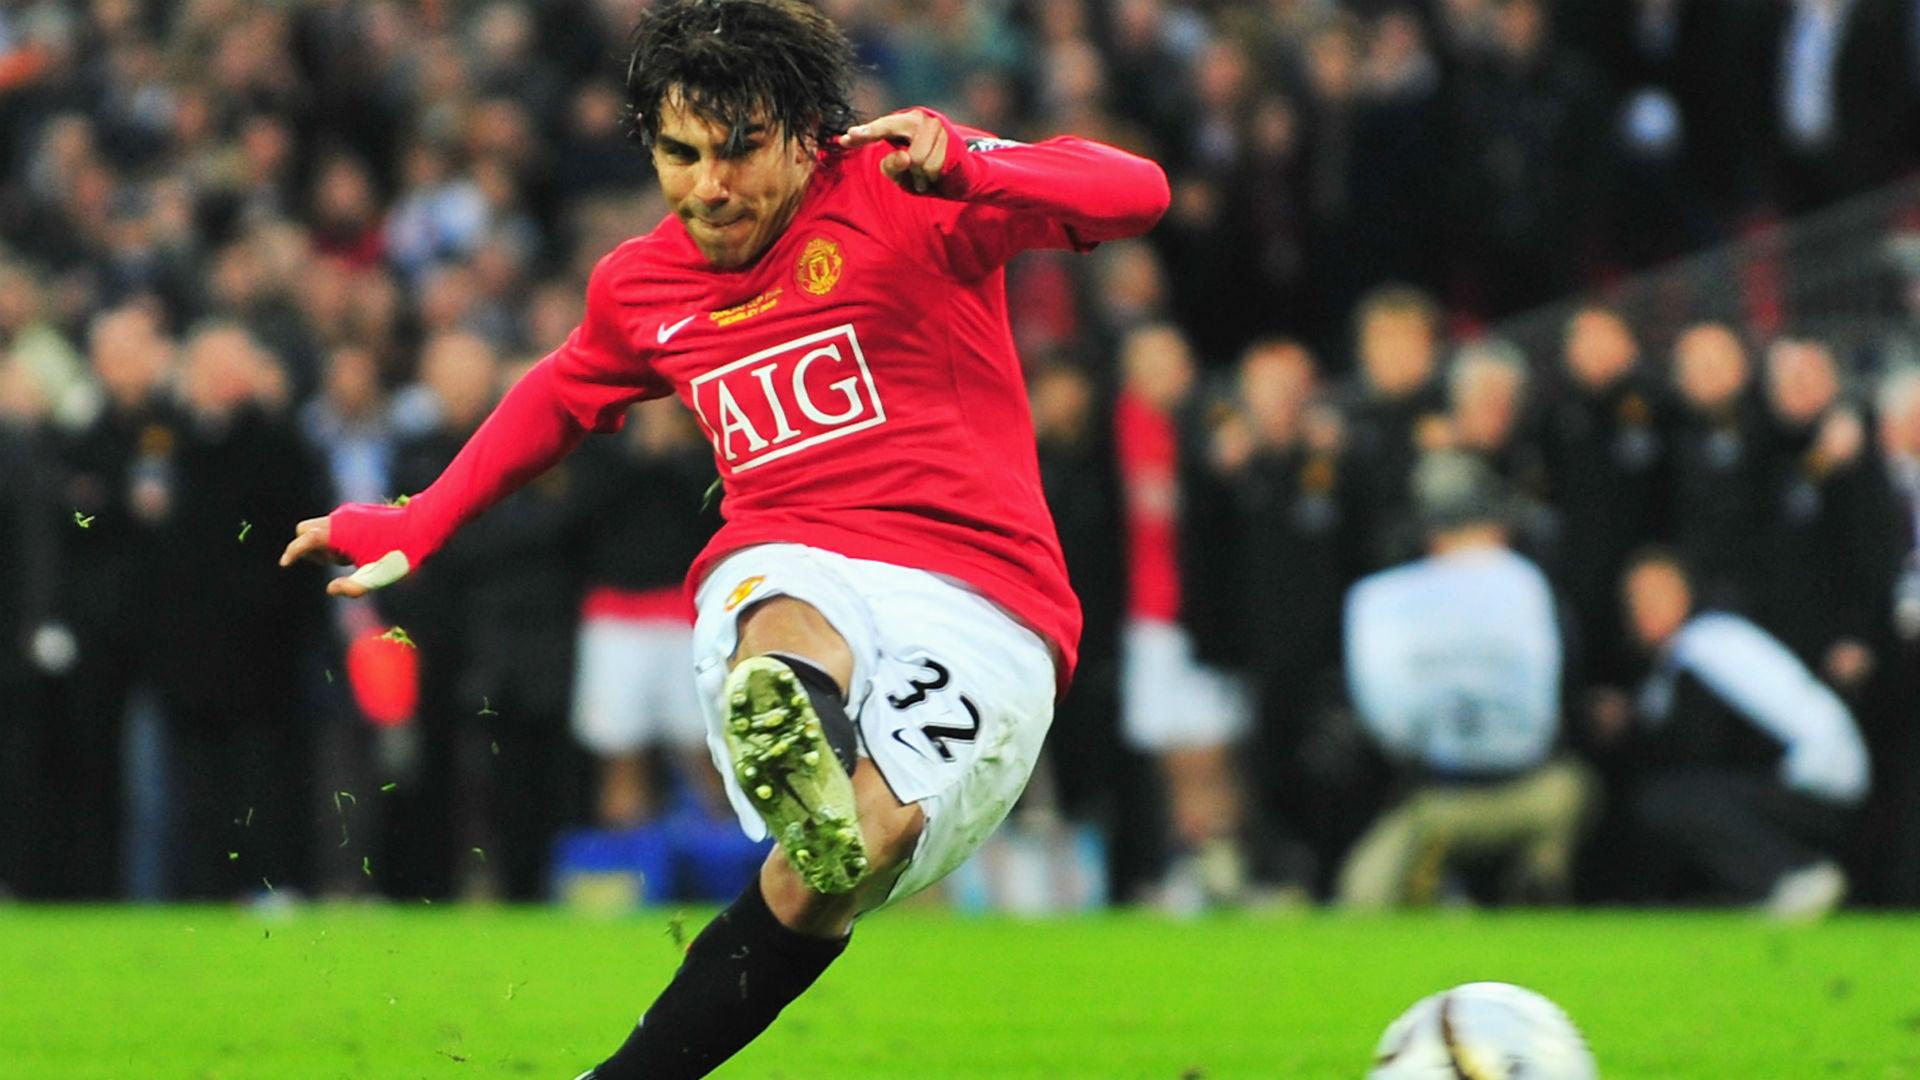 Carlos Tevez Carling Cup Final match between Manchester United Tottenham 2009